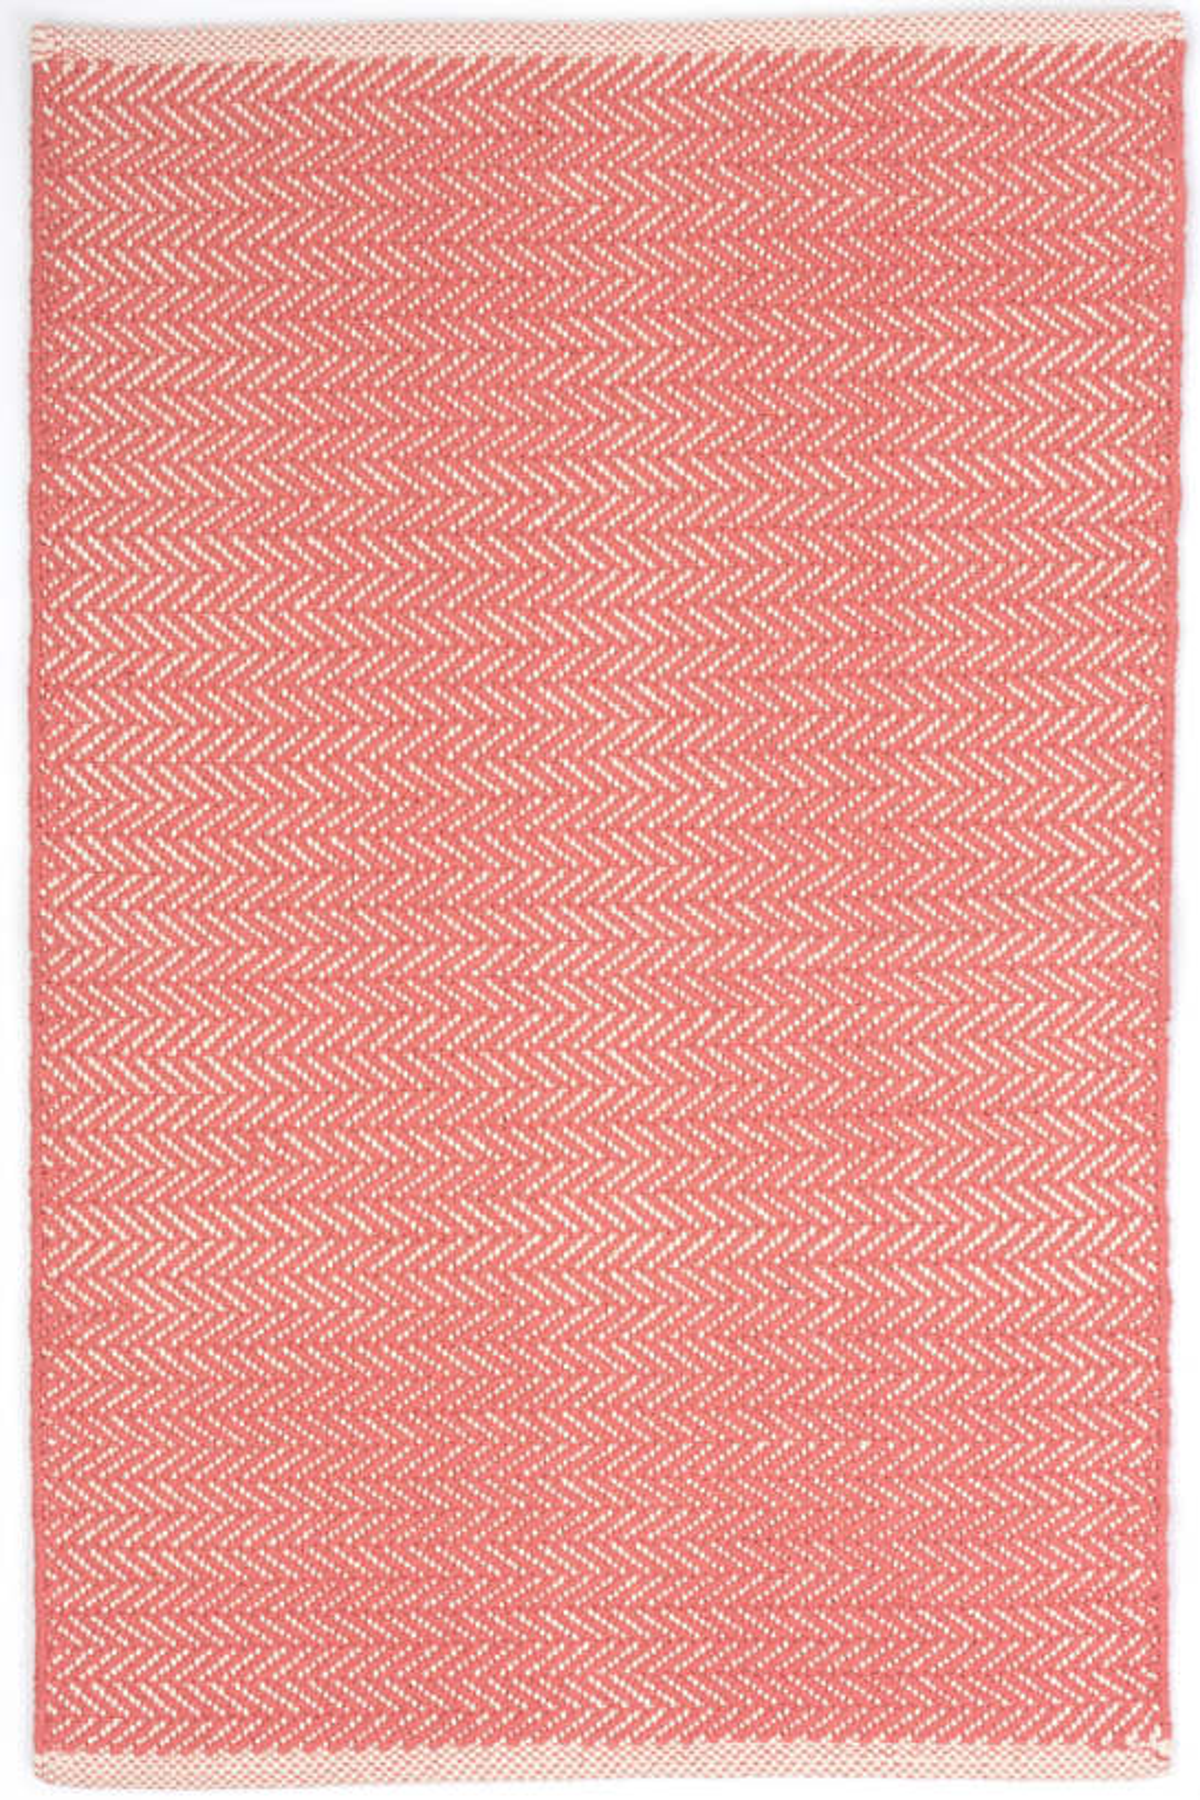 Herringbone Coral Woven Cotton Rug Dash Amp Albert